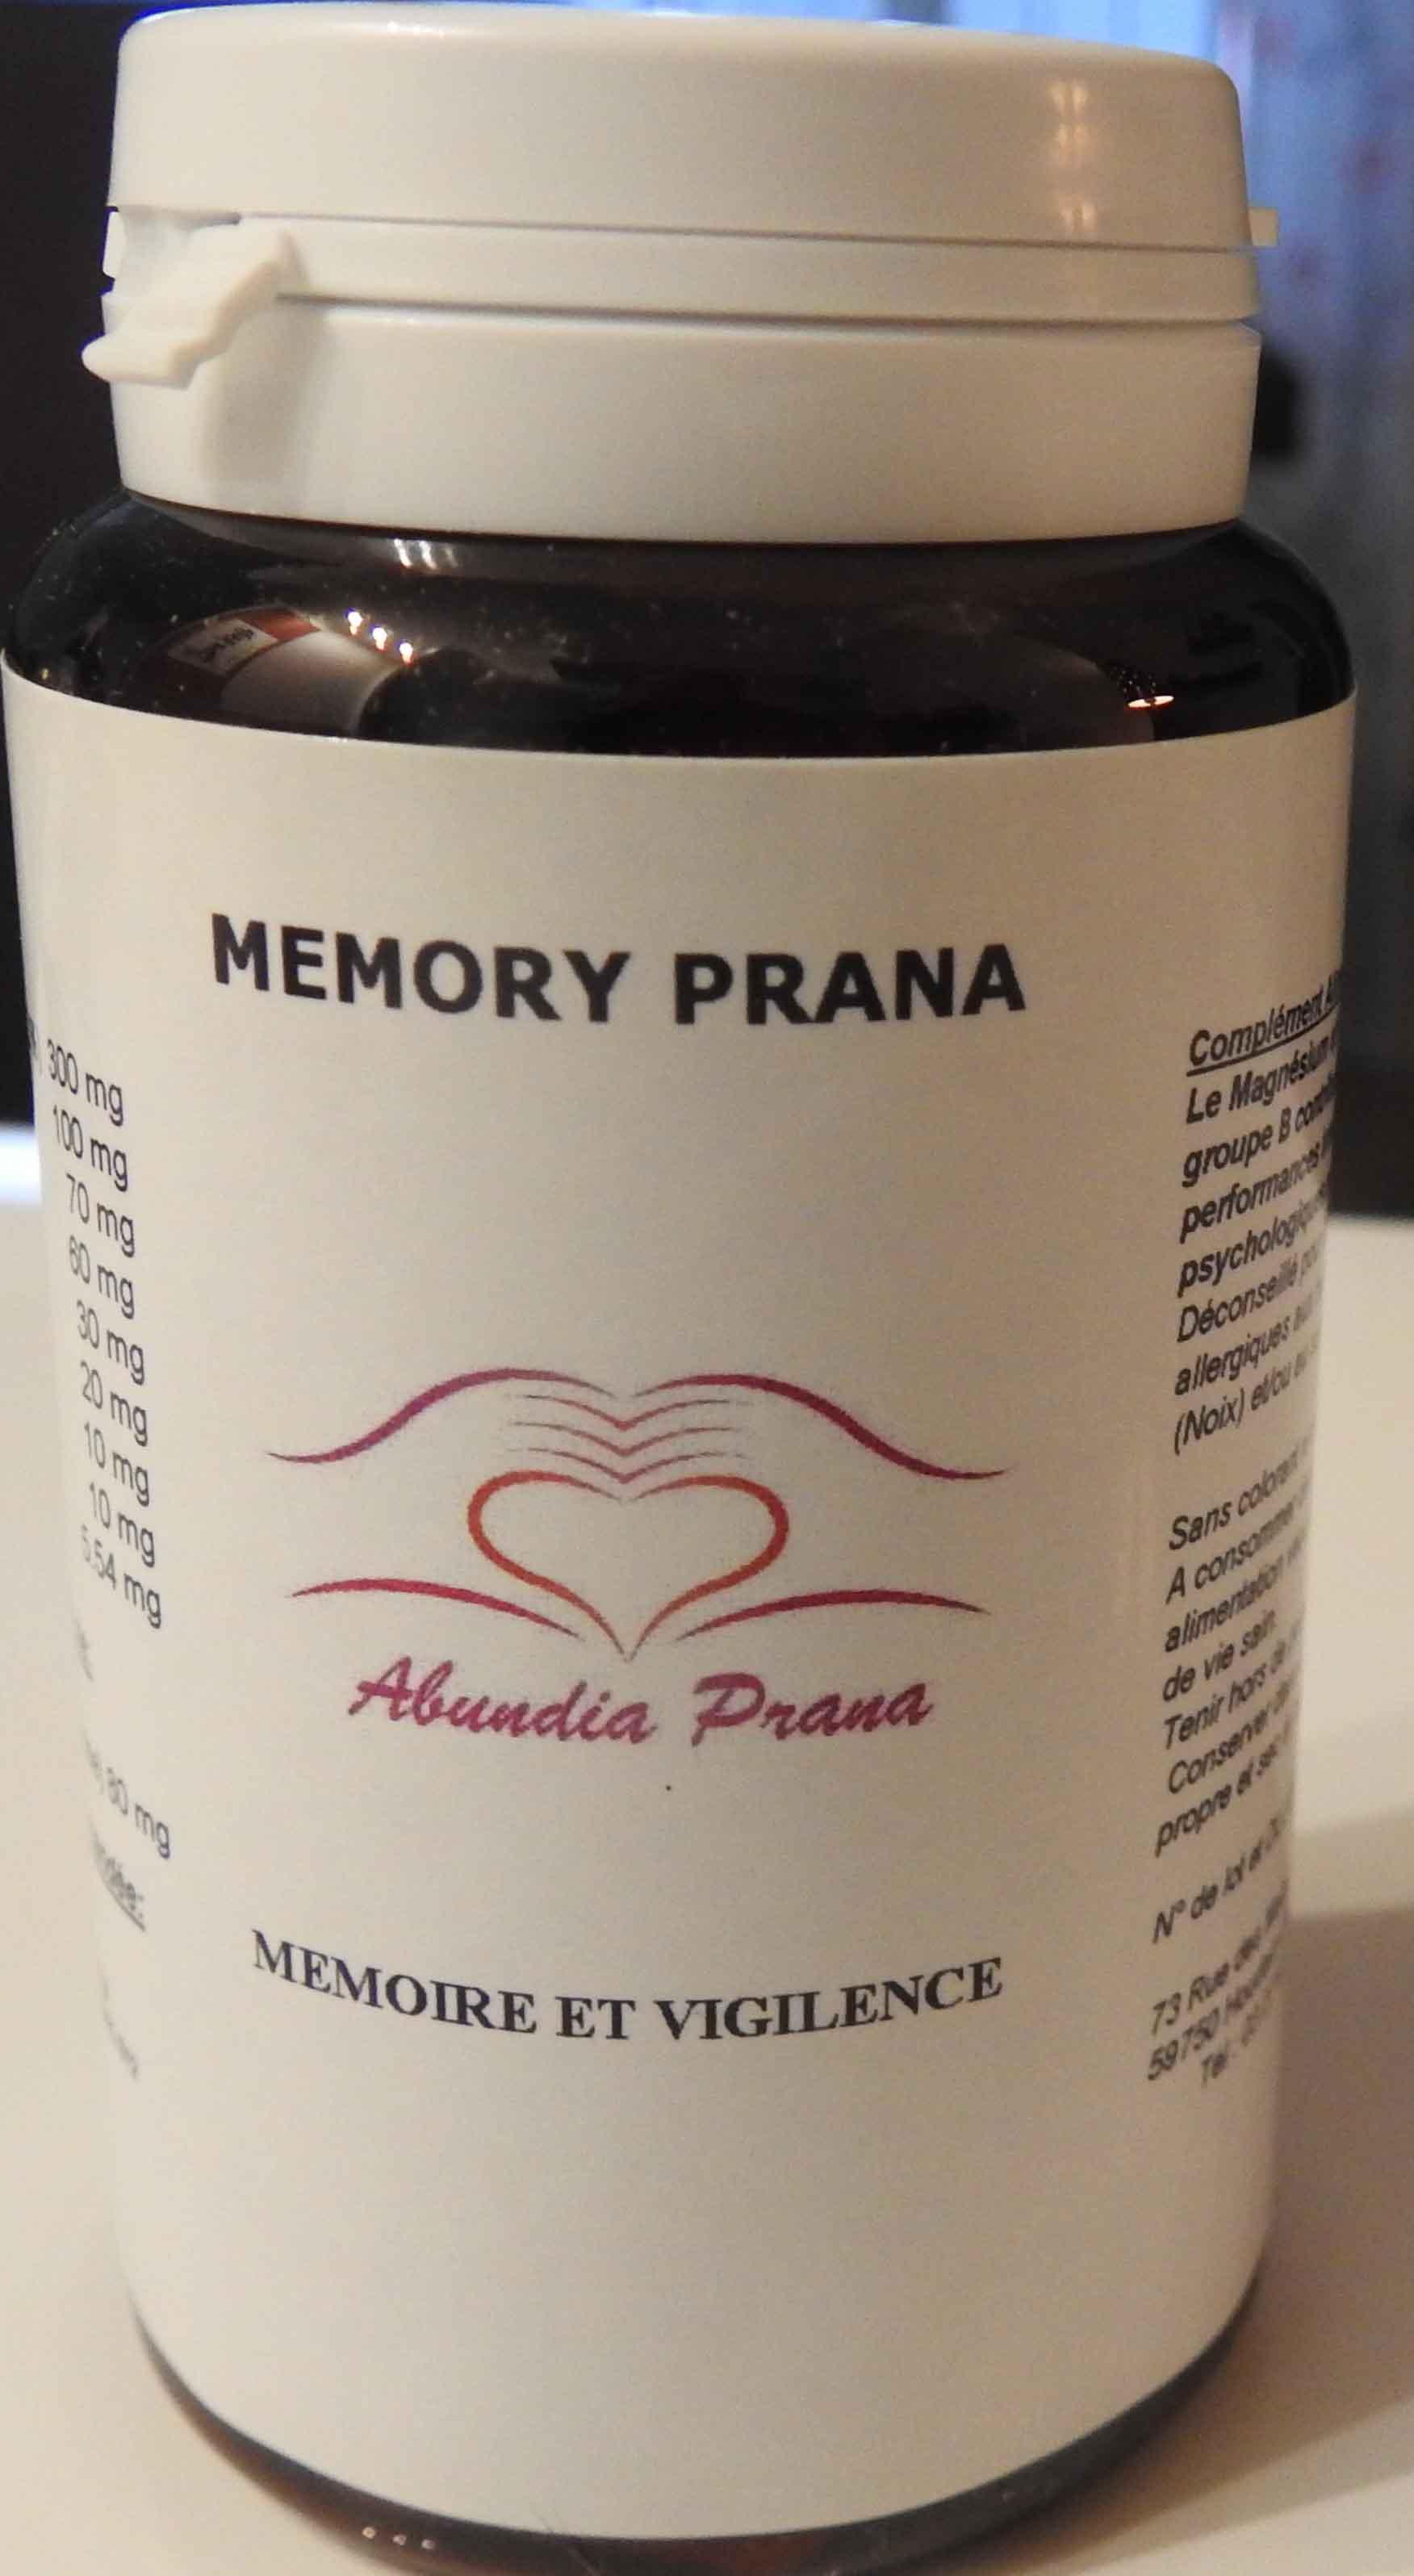 Memory prana